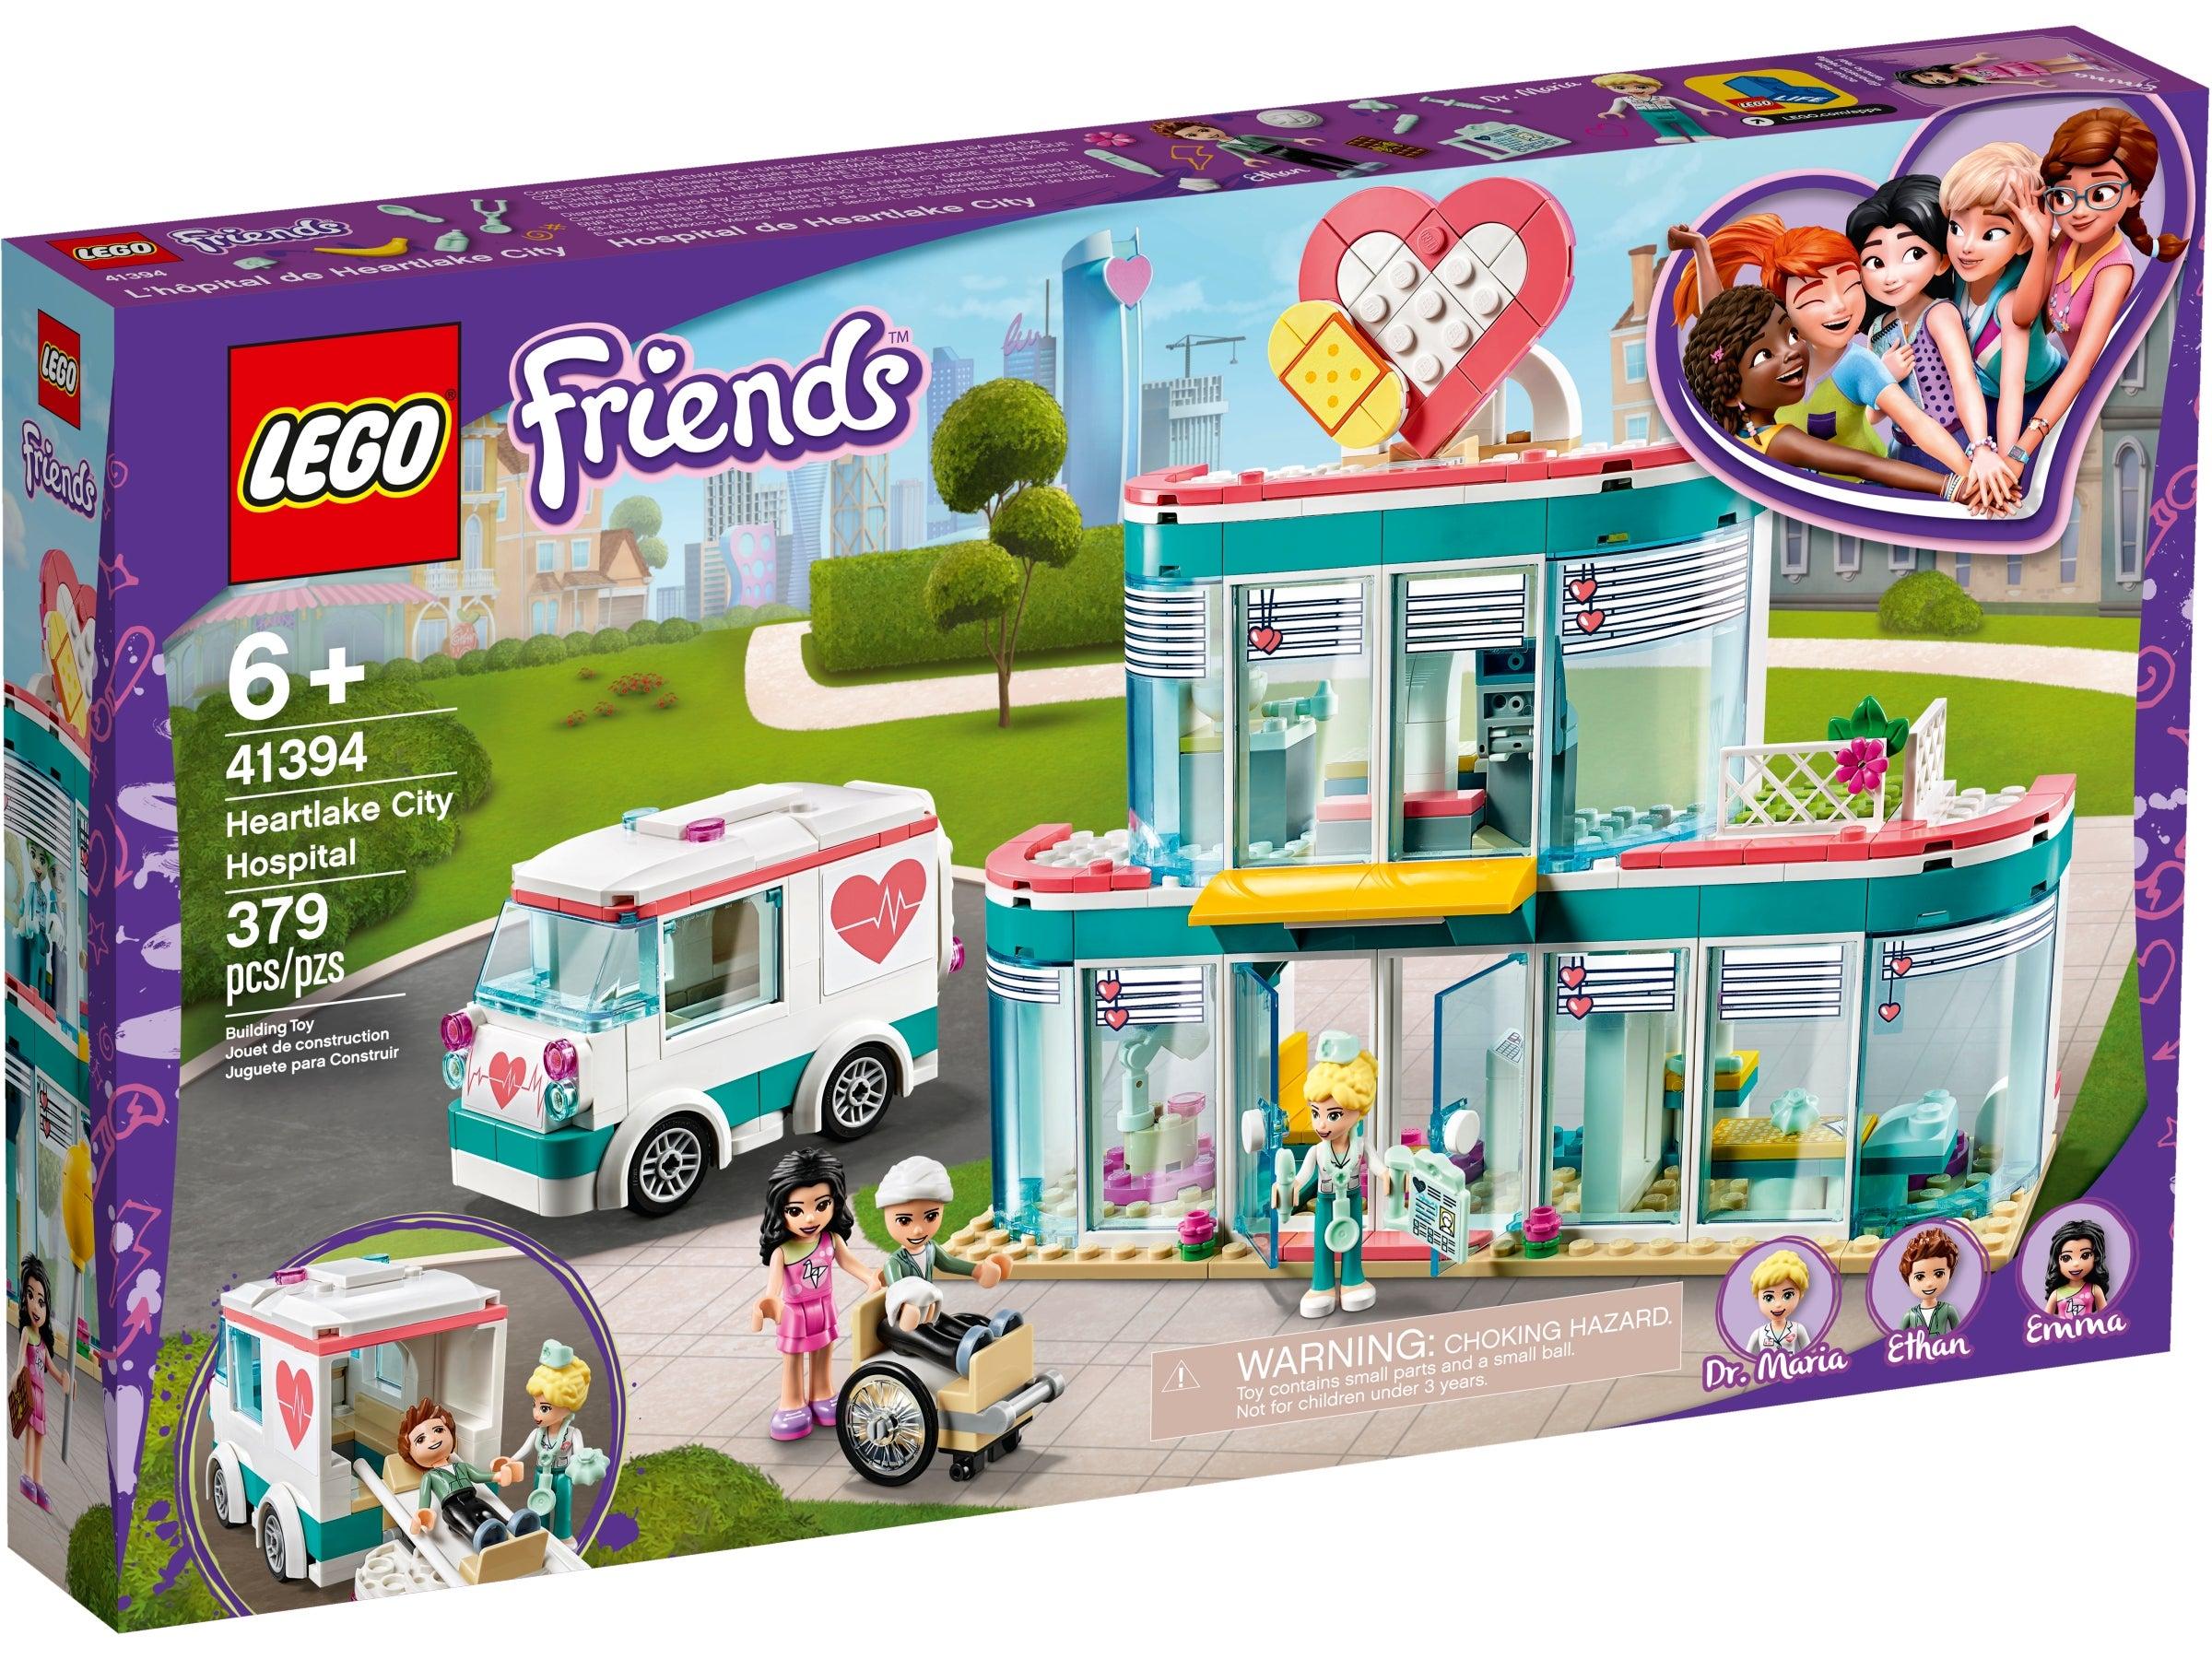 LEGO® Friends Heartlake City Hospital 41394 Brick New Toy